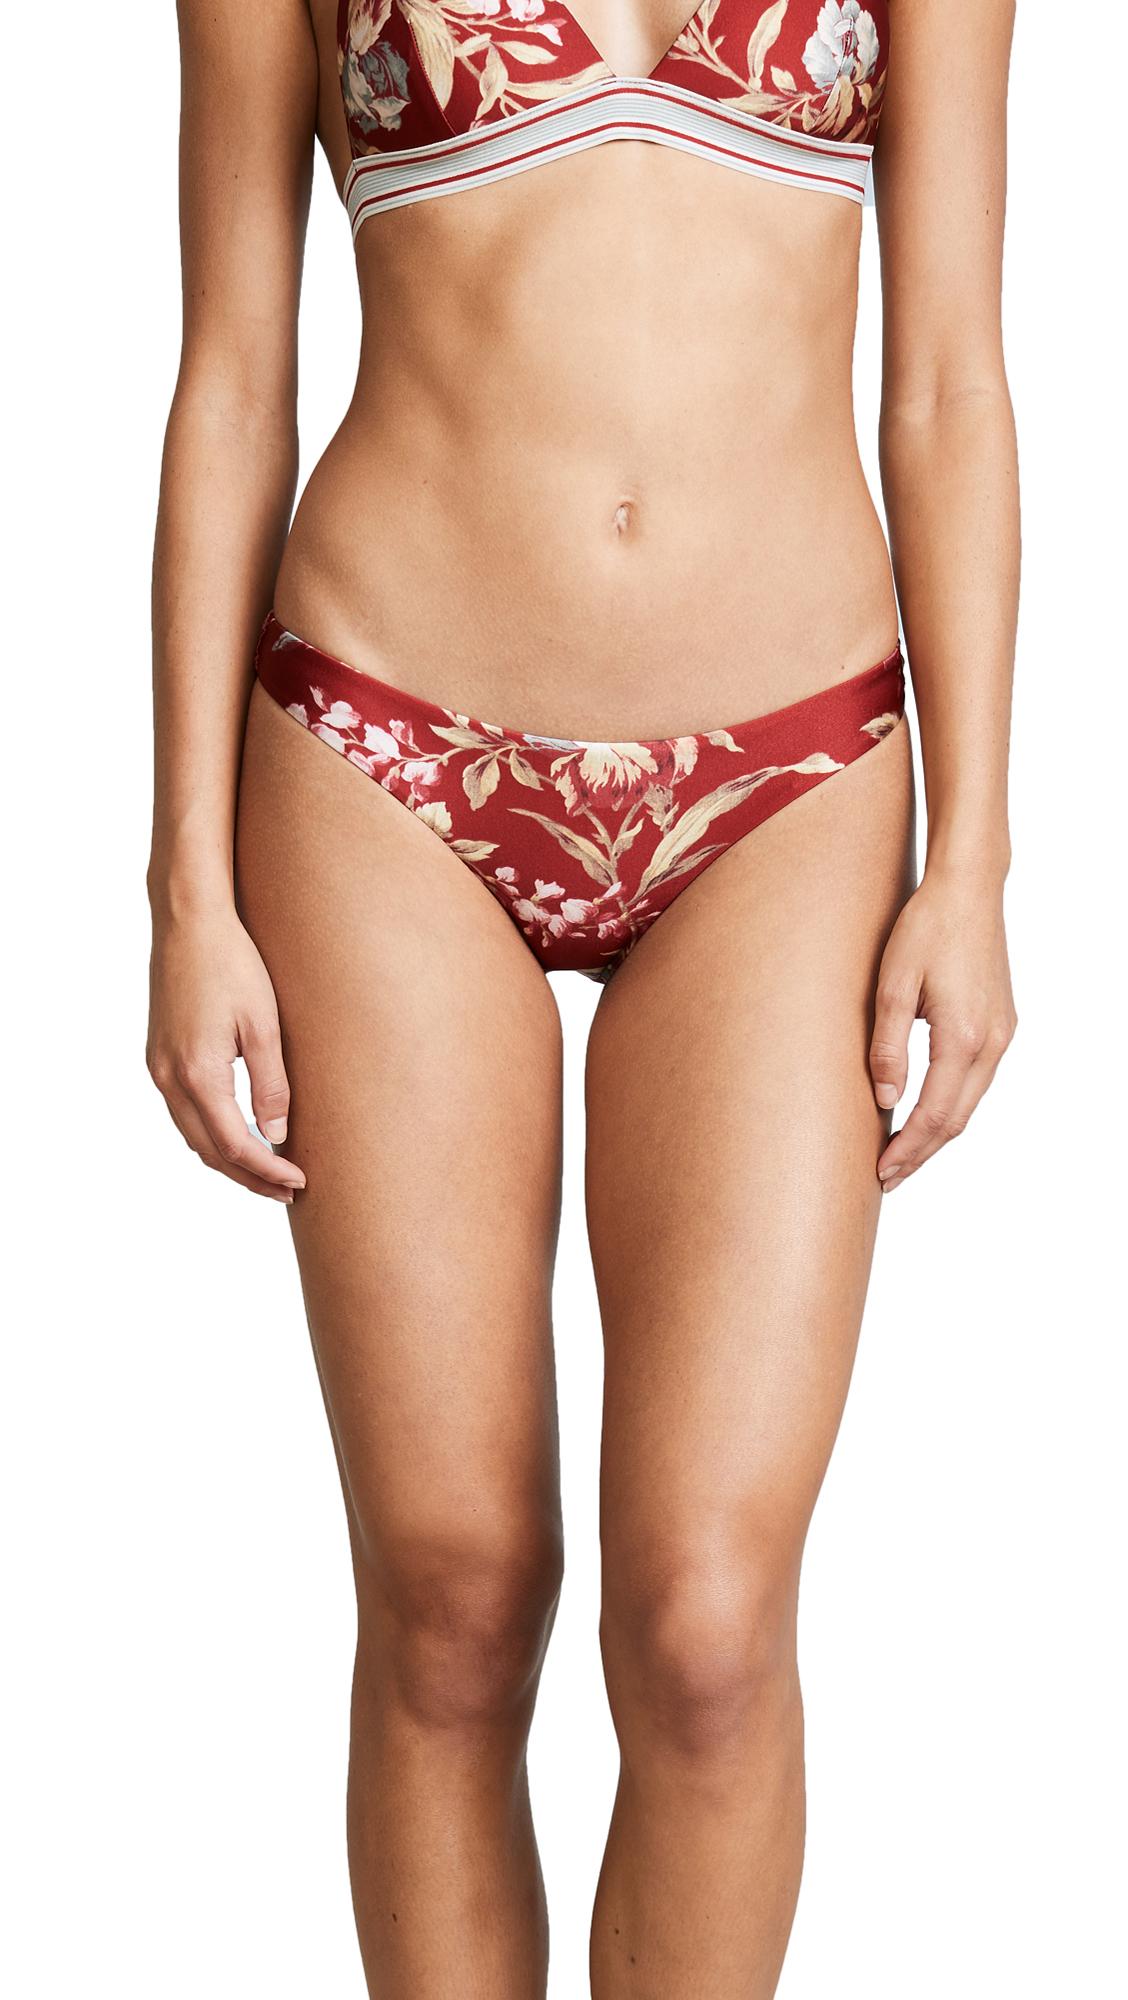 Zimmermann Corsair Skinny Bikini Bottoms - Washed Iris